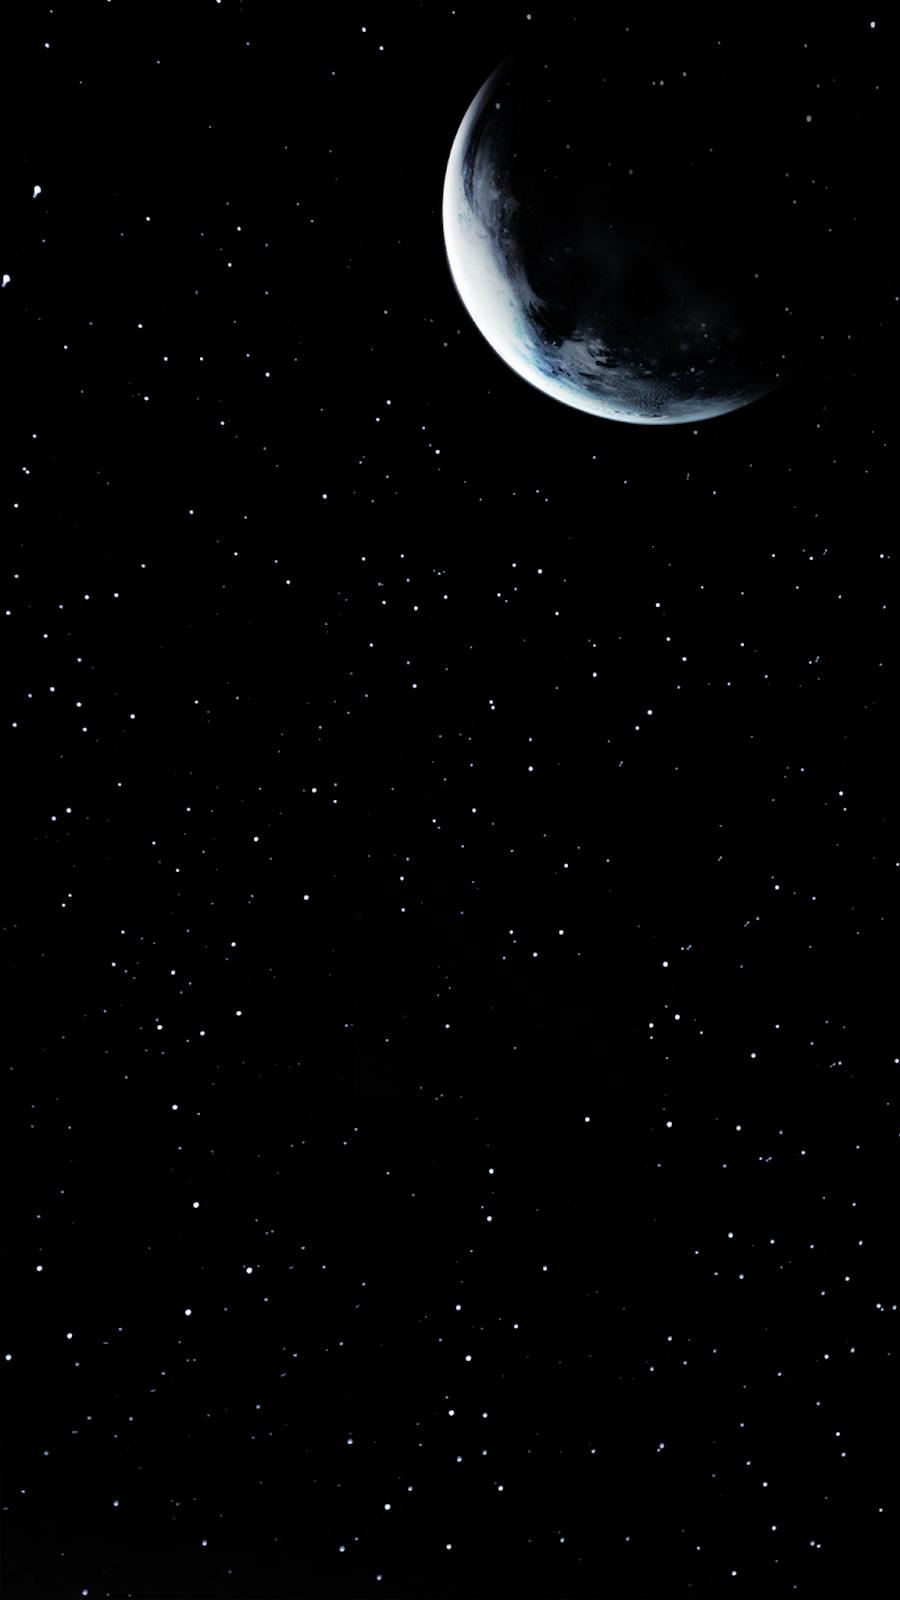 Sky Atmosphere Cloud Nature Atmospheric Phenomenon Darkness Iphone Wallpaper Di 2020 Langit Malam Langit Latar Belakang